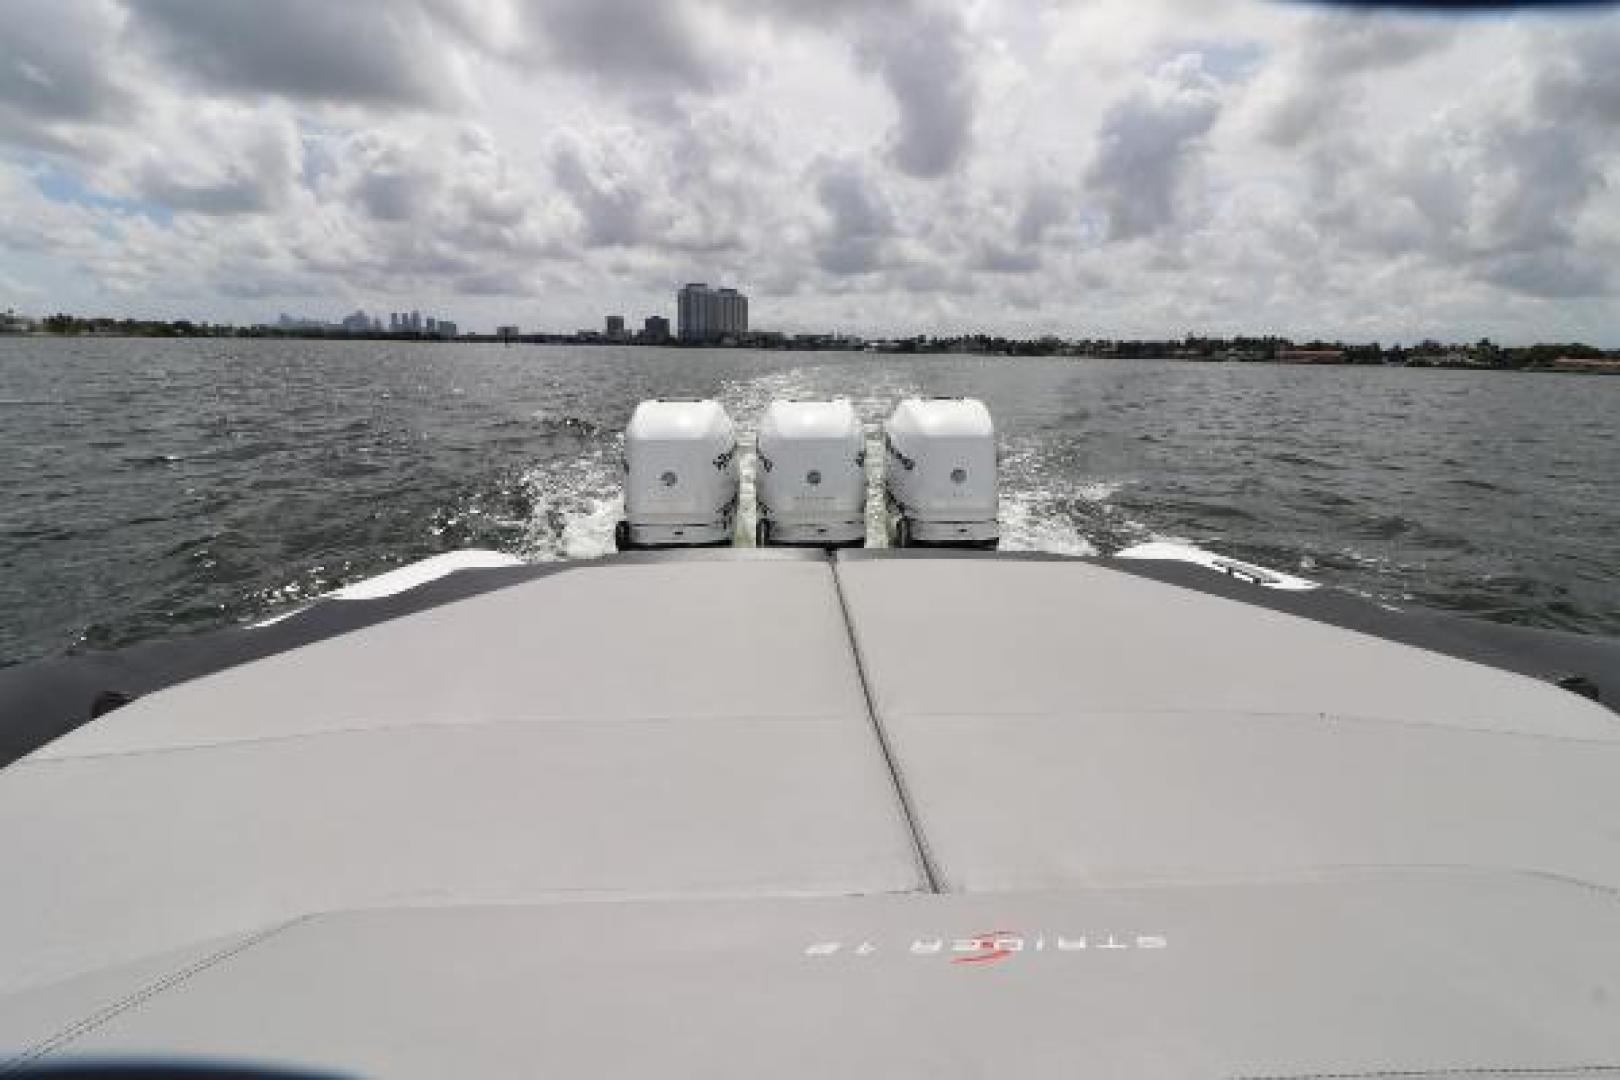 Sacs-Strider 40 ESSE R 2016-Sacs Strider 40 ESSE R Fort Lauderdale-Florida-United States-1533430   Thumbnail